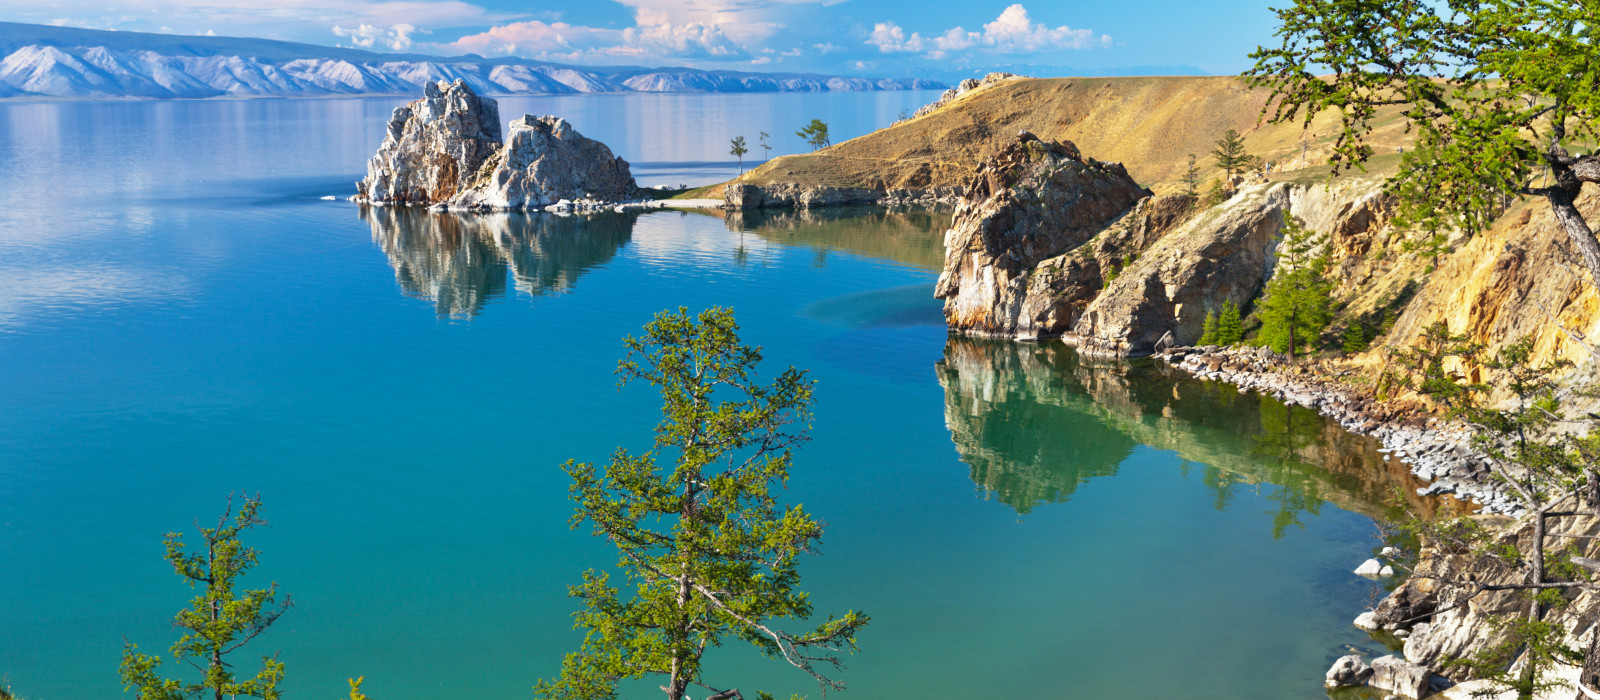 Destination Lake Baikal Russia